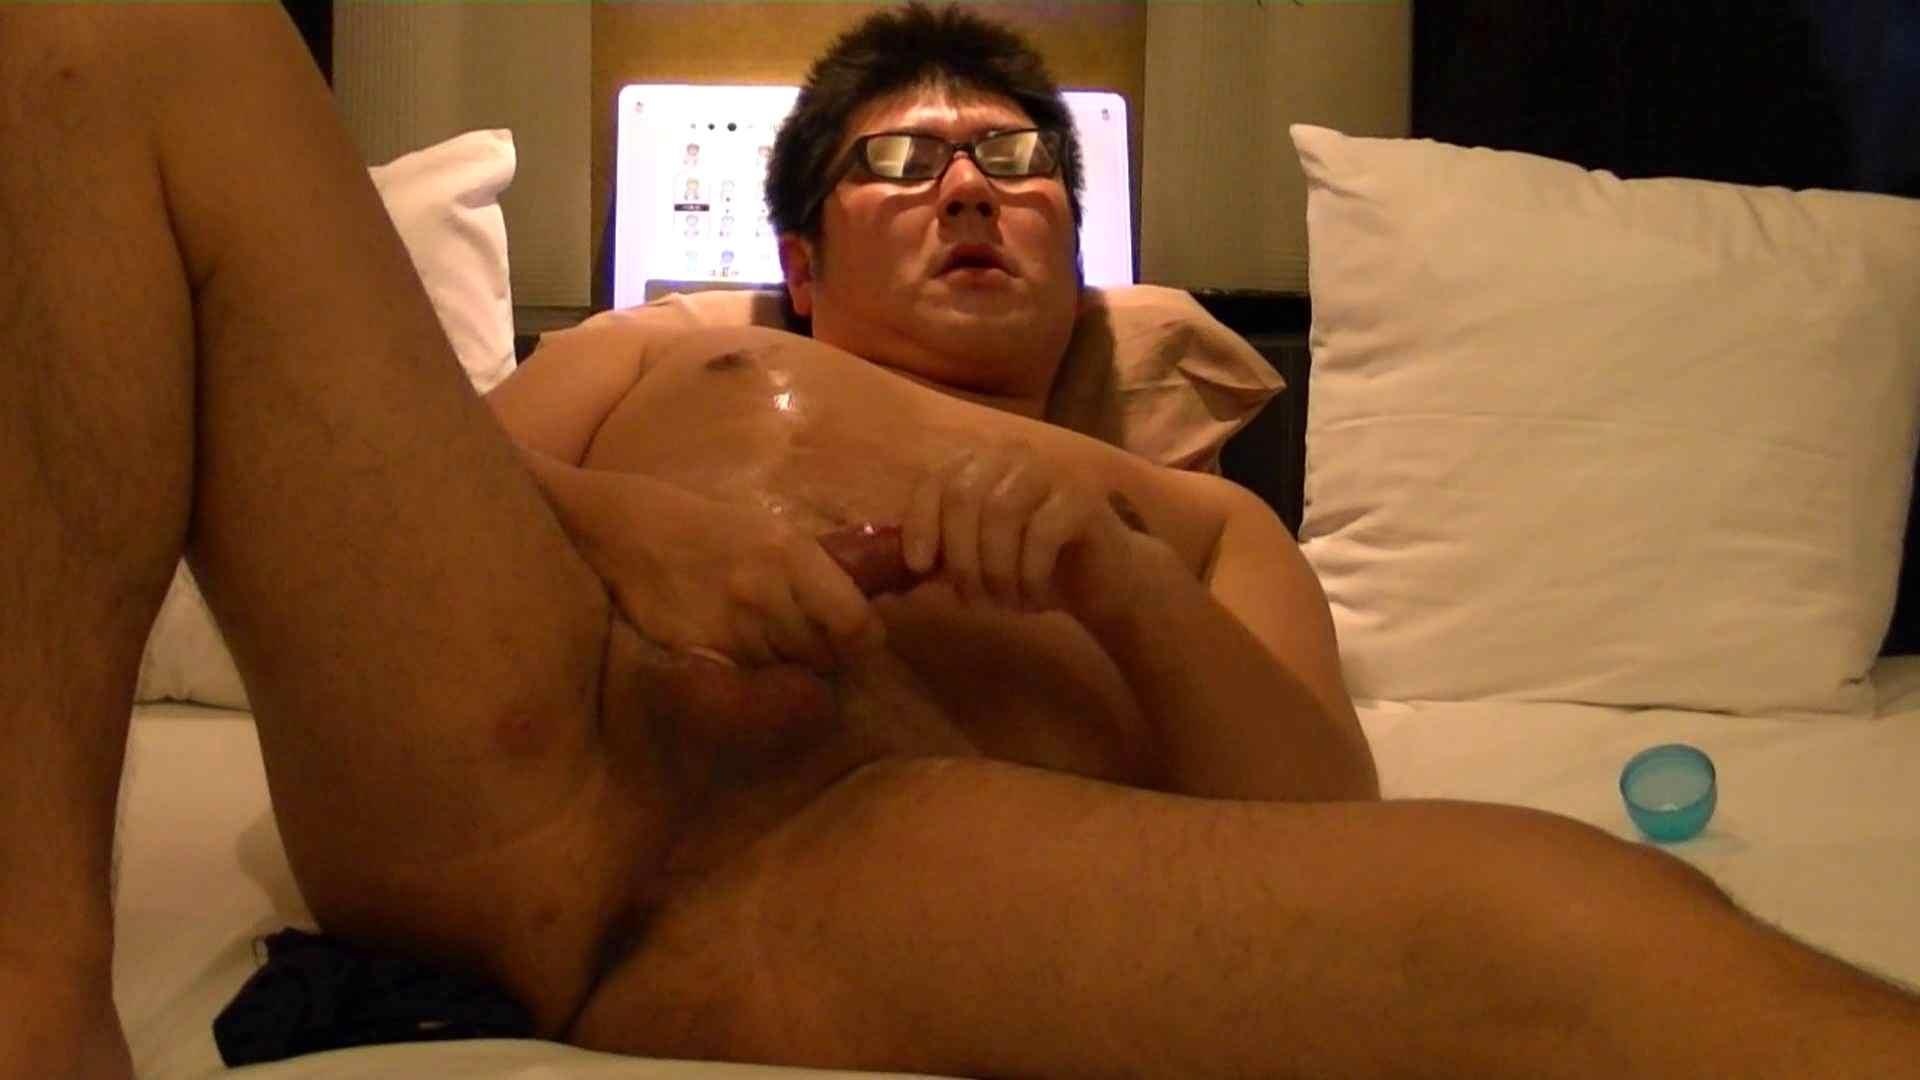 Mr.オナックスさん投稿!HD 貴方のオナニー三万円で撮影させてください。VOL.03 後編 投稿 ゲイ無修正ビデオ画像 106枚 81